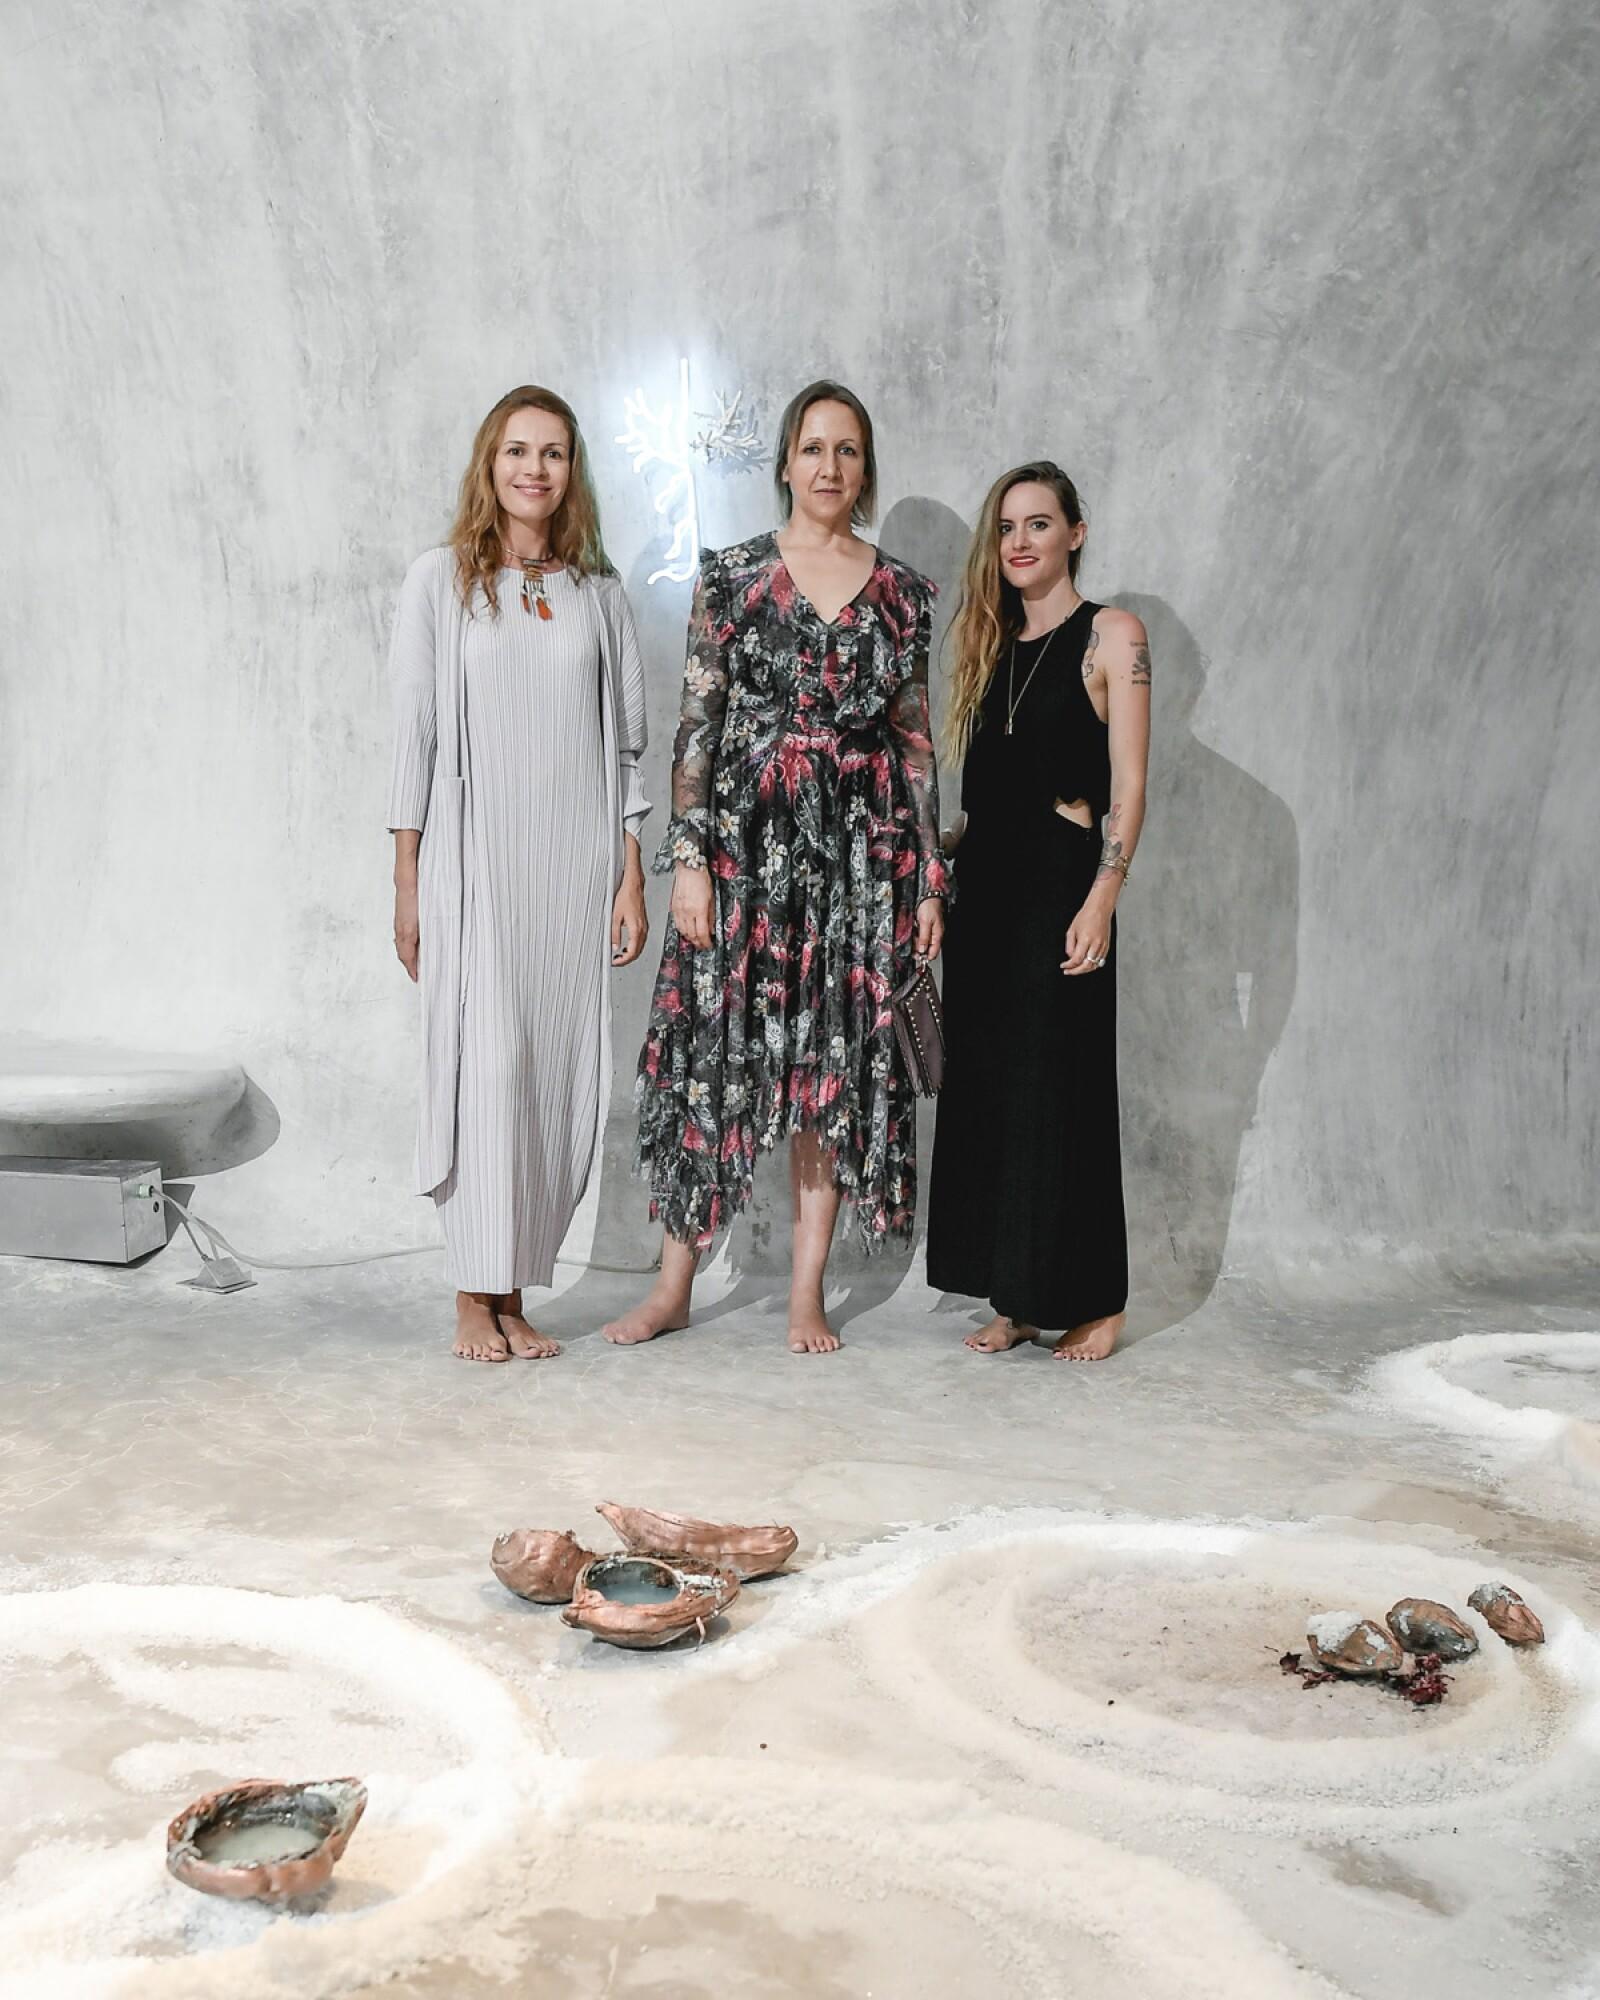 Margo Trushina, Claudia Paetzold y Bianca Bondi.jpg